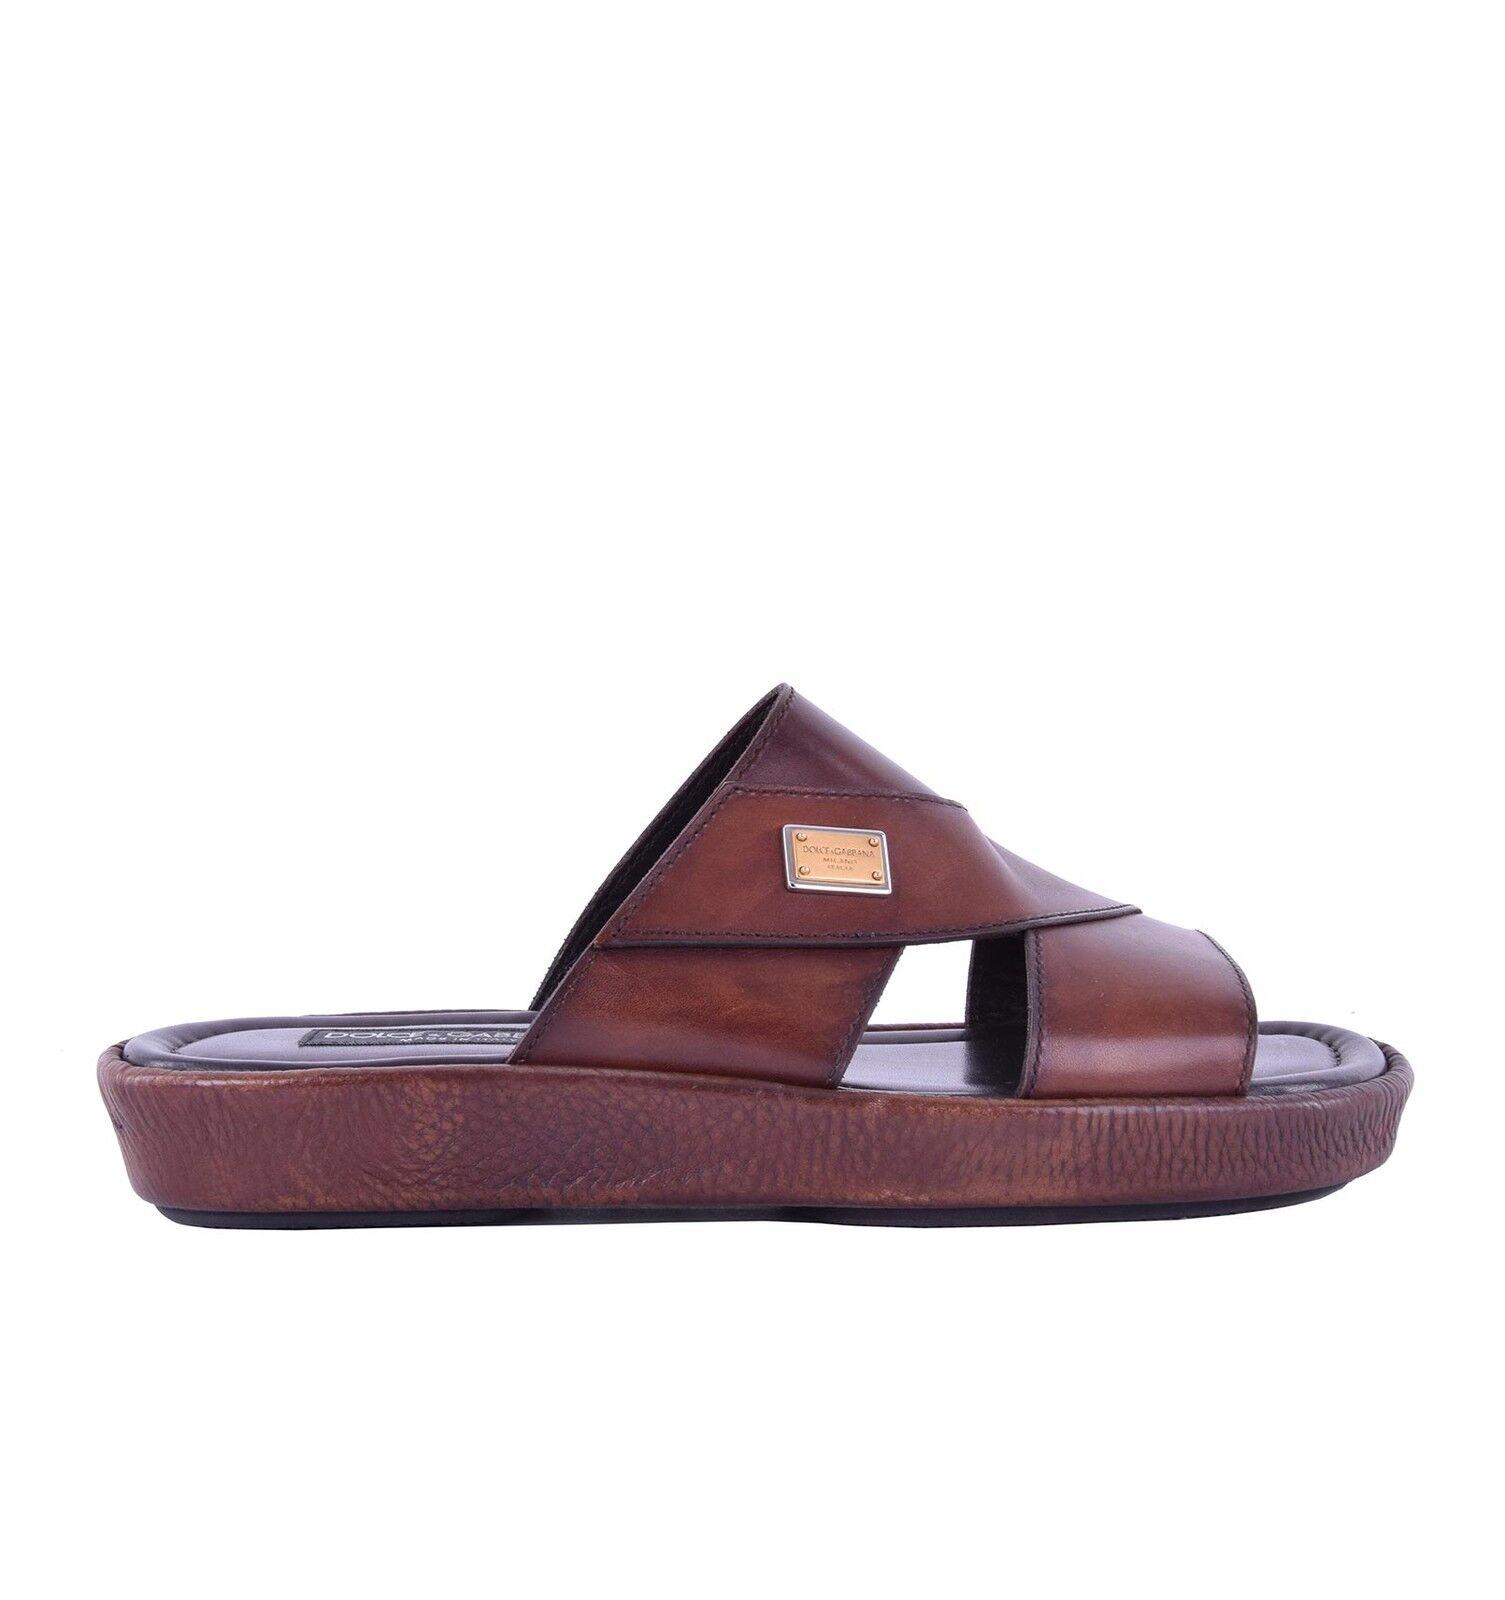 DOLCE & GABBANA Patent Leather Logo Sandals MEDITERRANEO Brown Shoes 05224